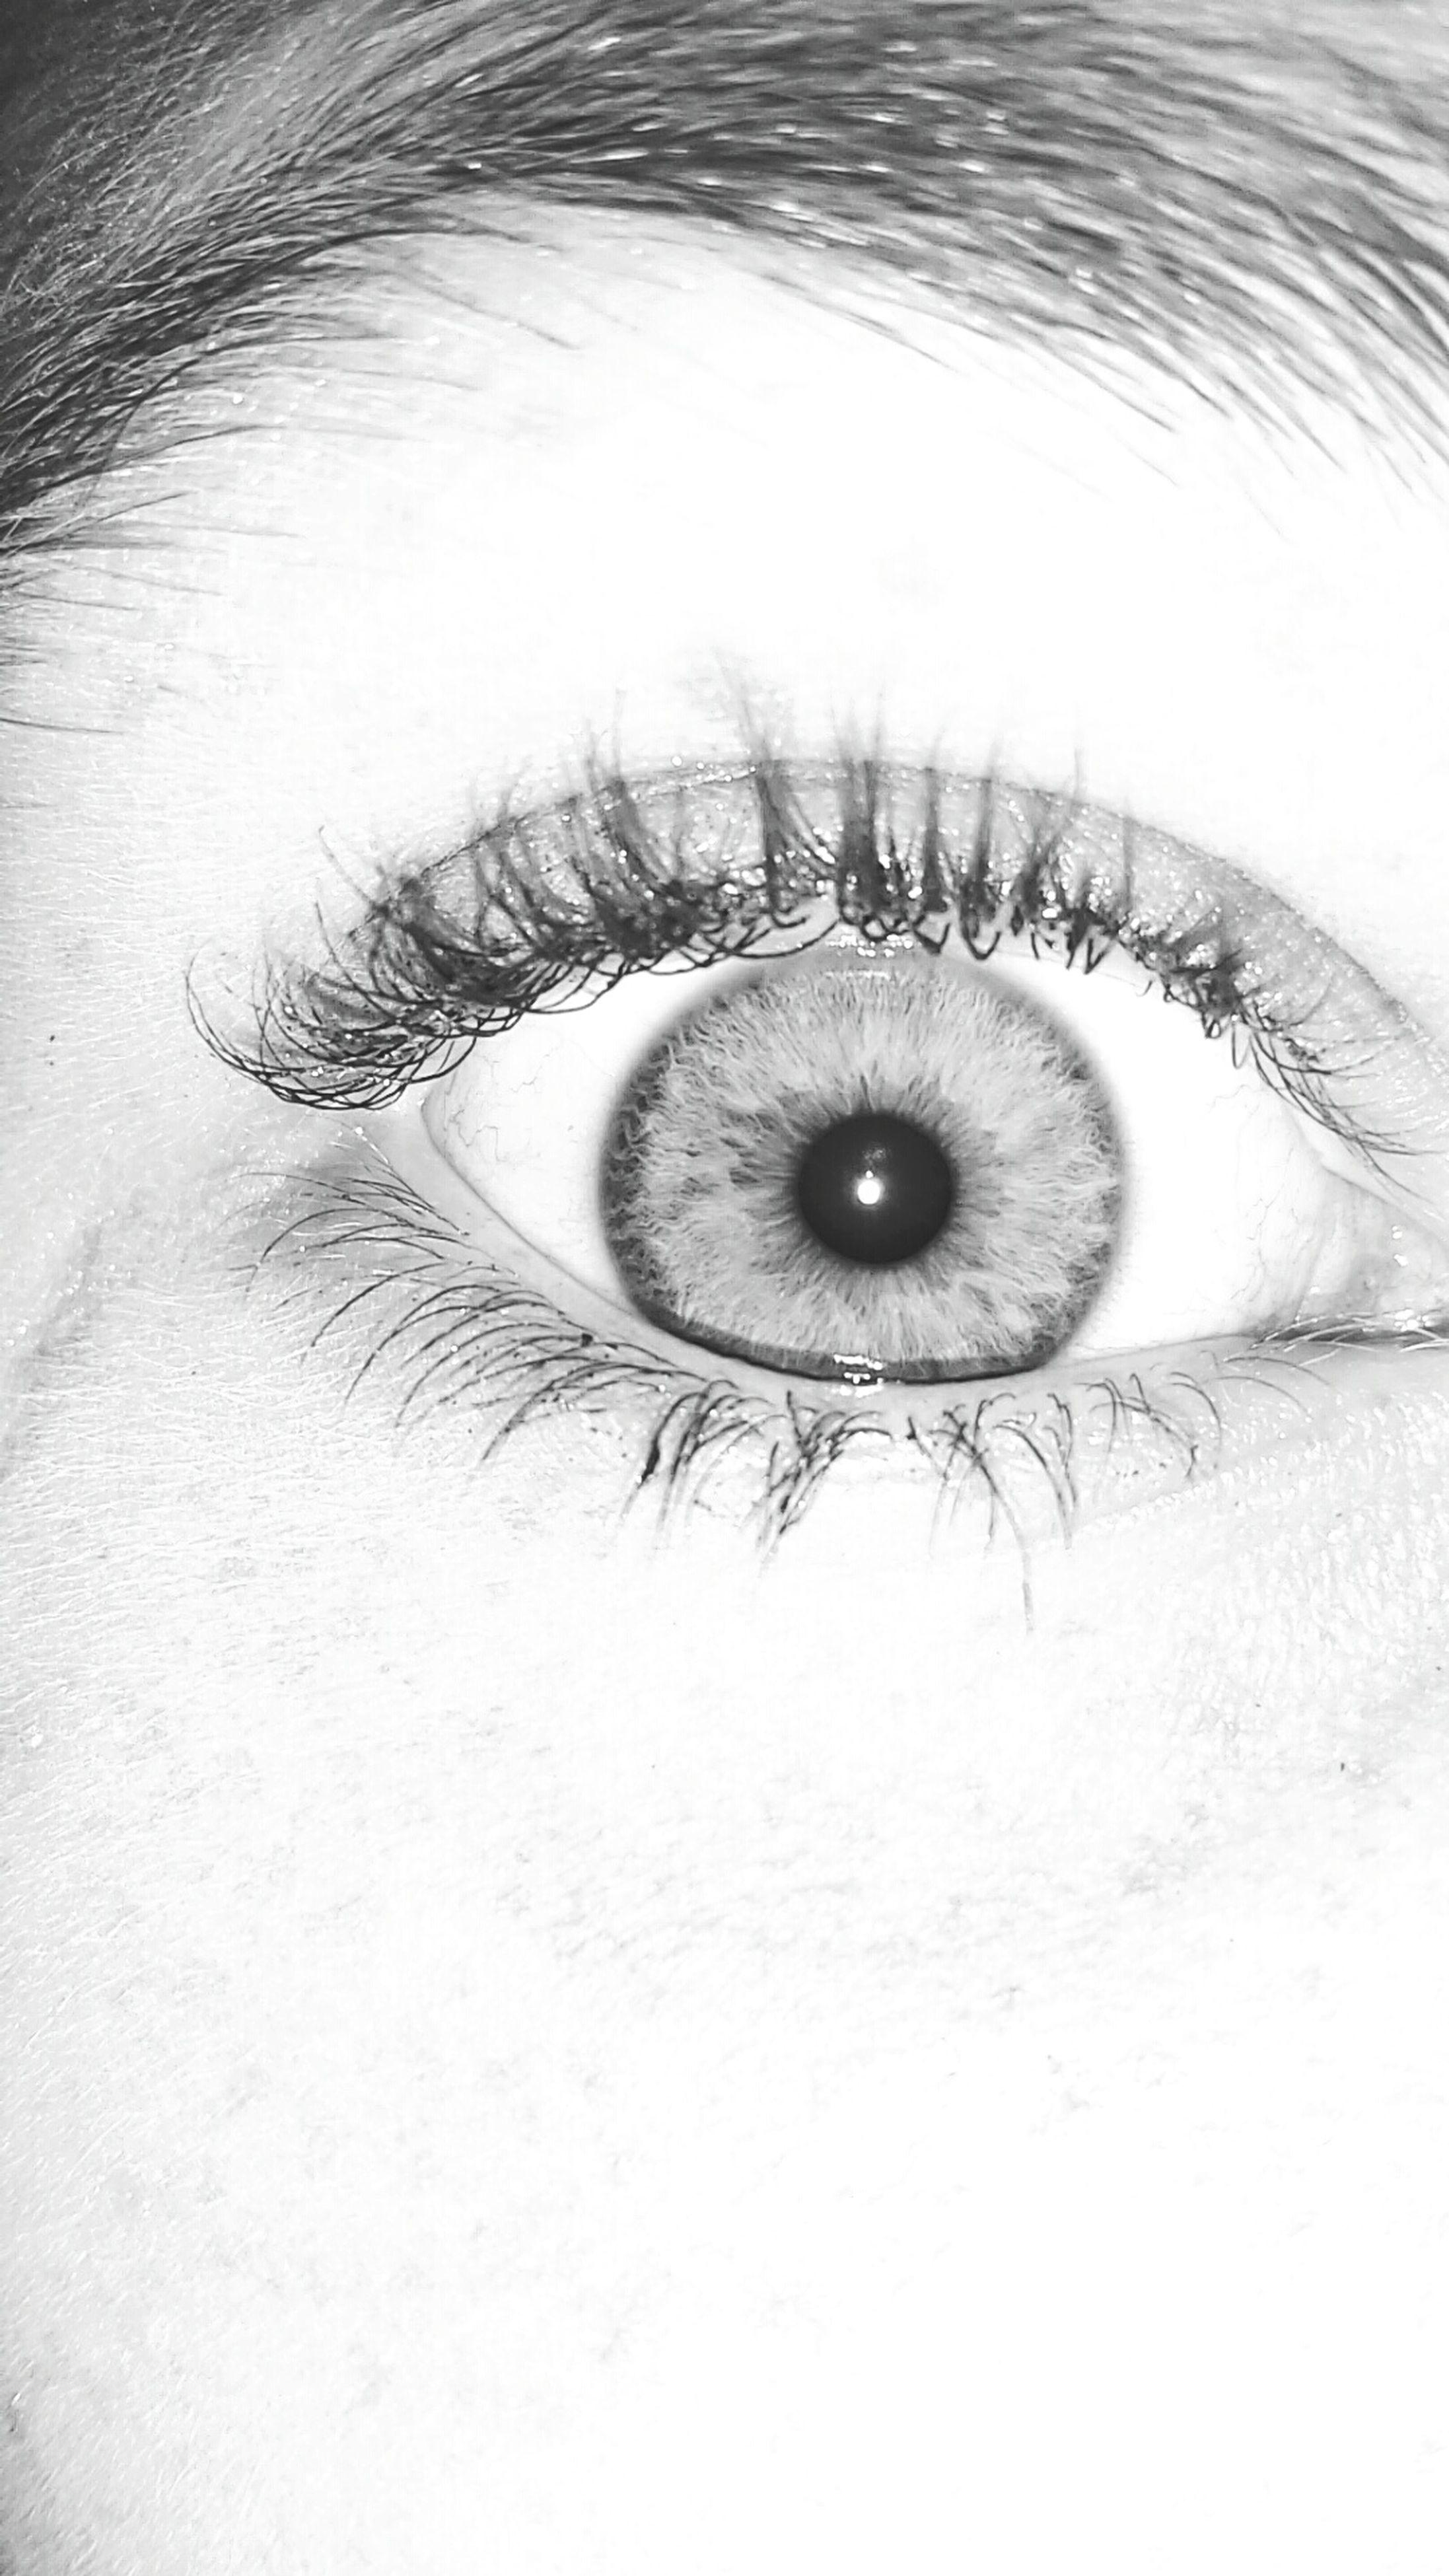 human eye, close-up, looking at camera, sensory perception, eyesight, portrait, eyelash, part of, circle, eyeball, high angle view, iris - eye, full frame, indoors, extreme close-up, staring, unrecognizable person